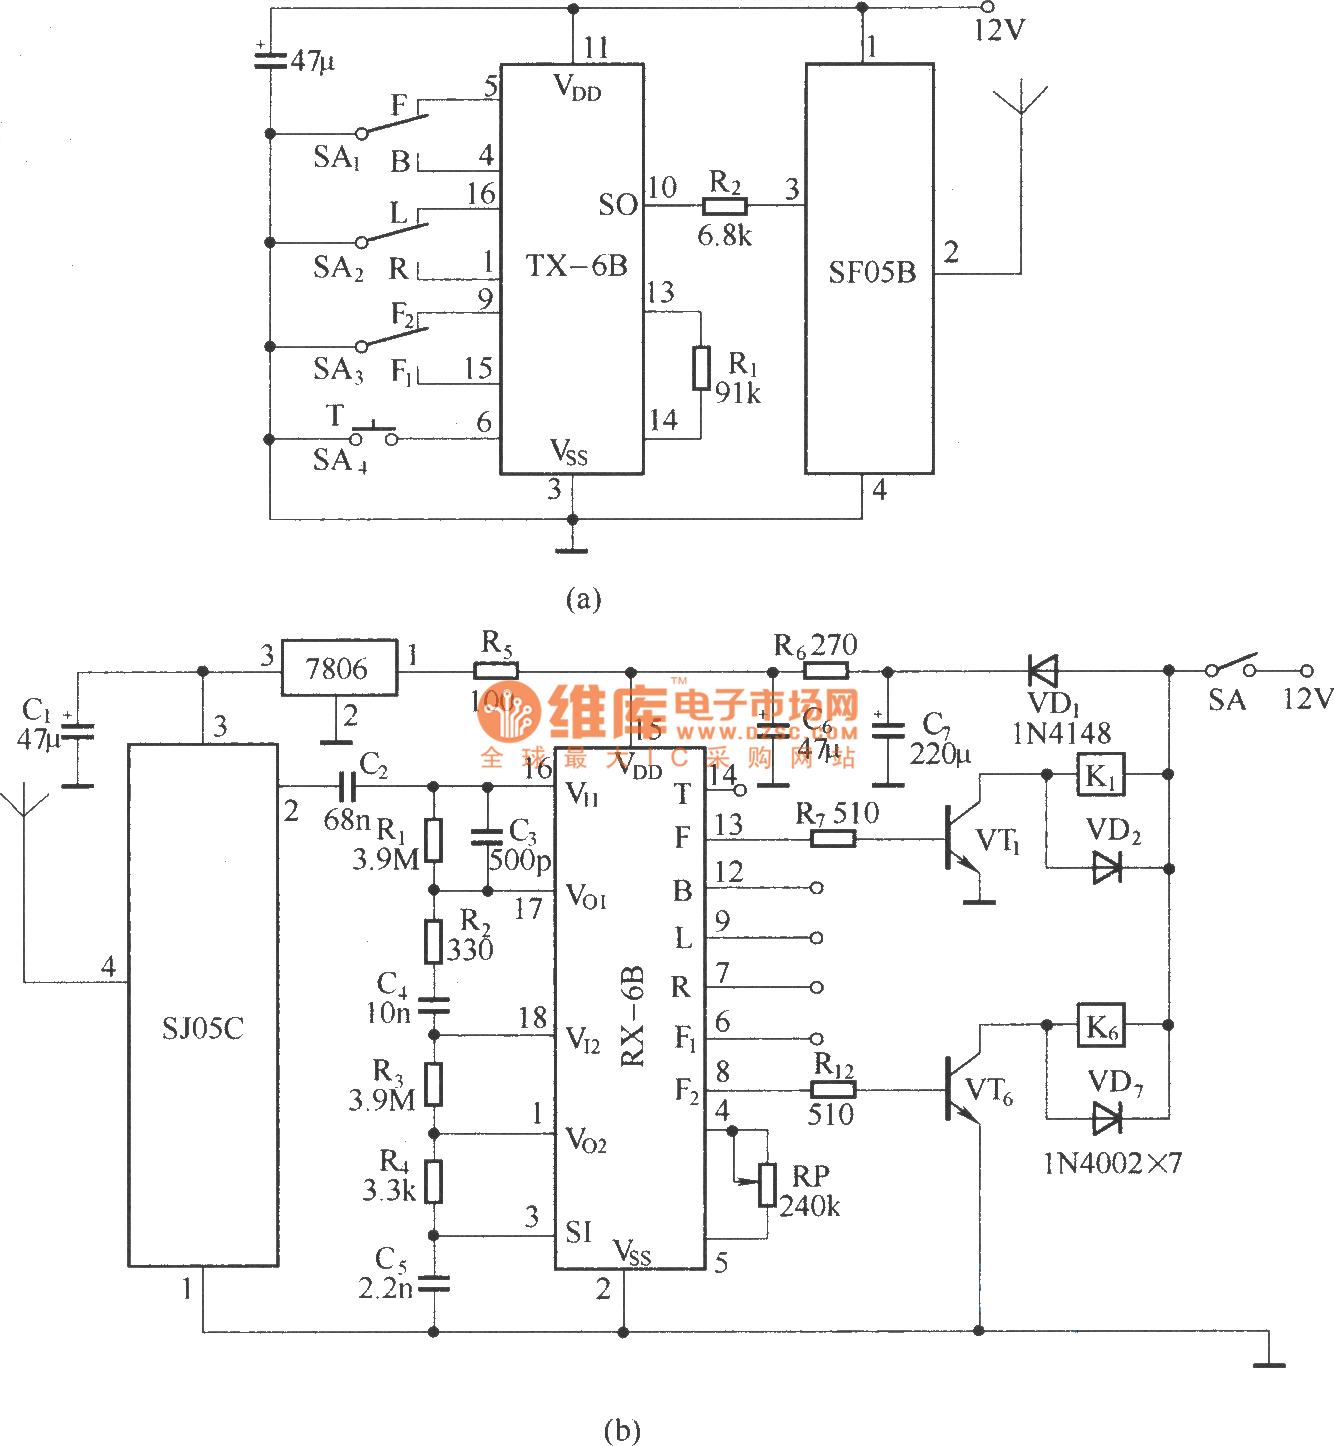 hight resolution of schematic diagram remotecontrolcircuit circuit diagram seekic channel keyboard control circuit controlcircuit circuit diagram